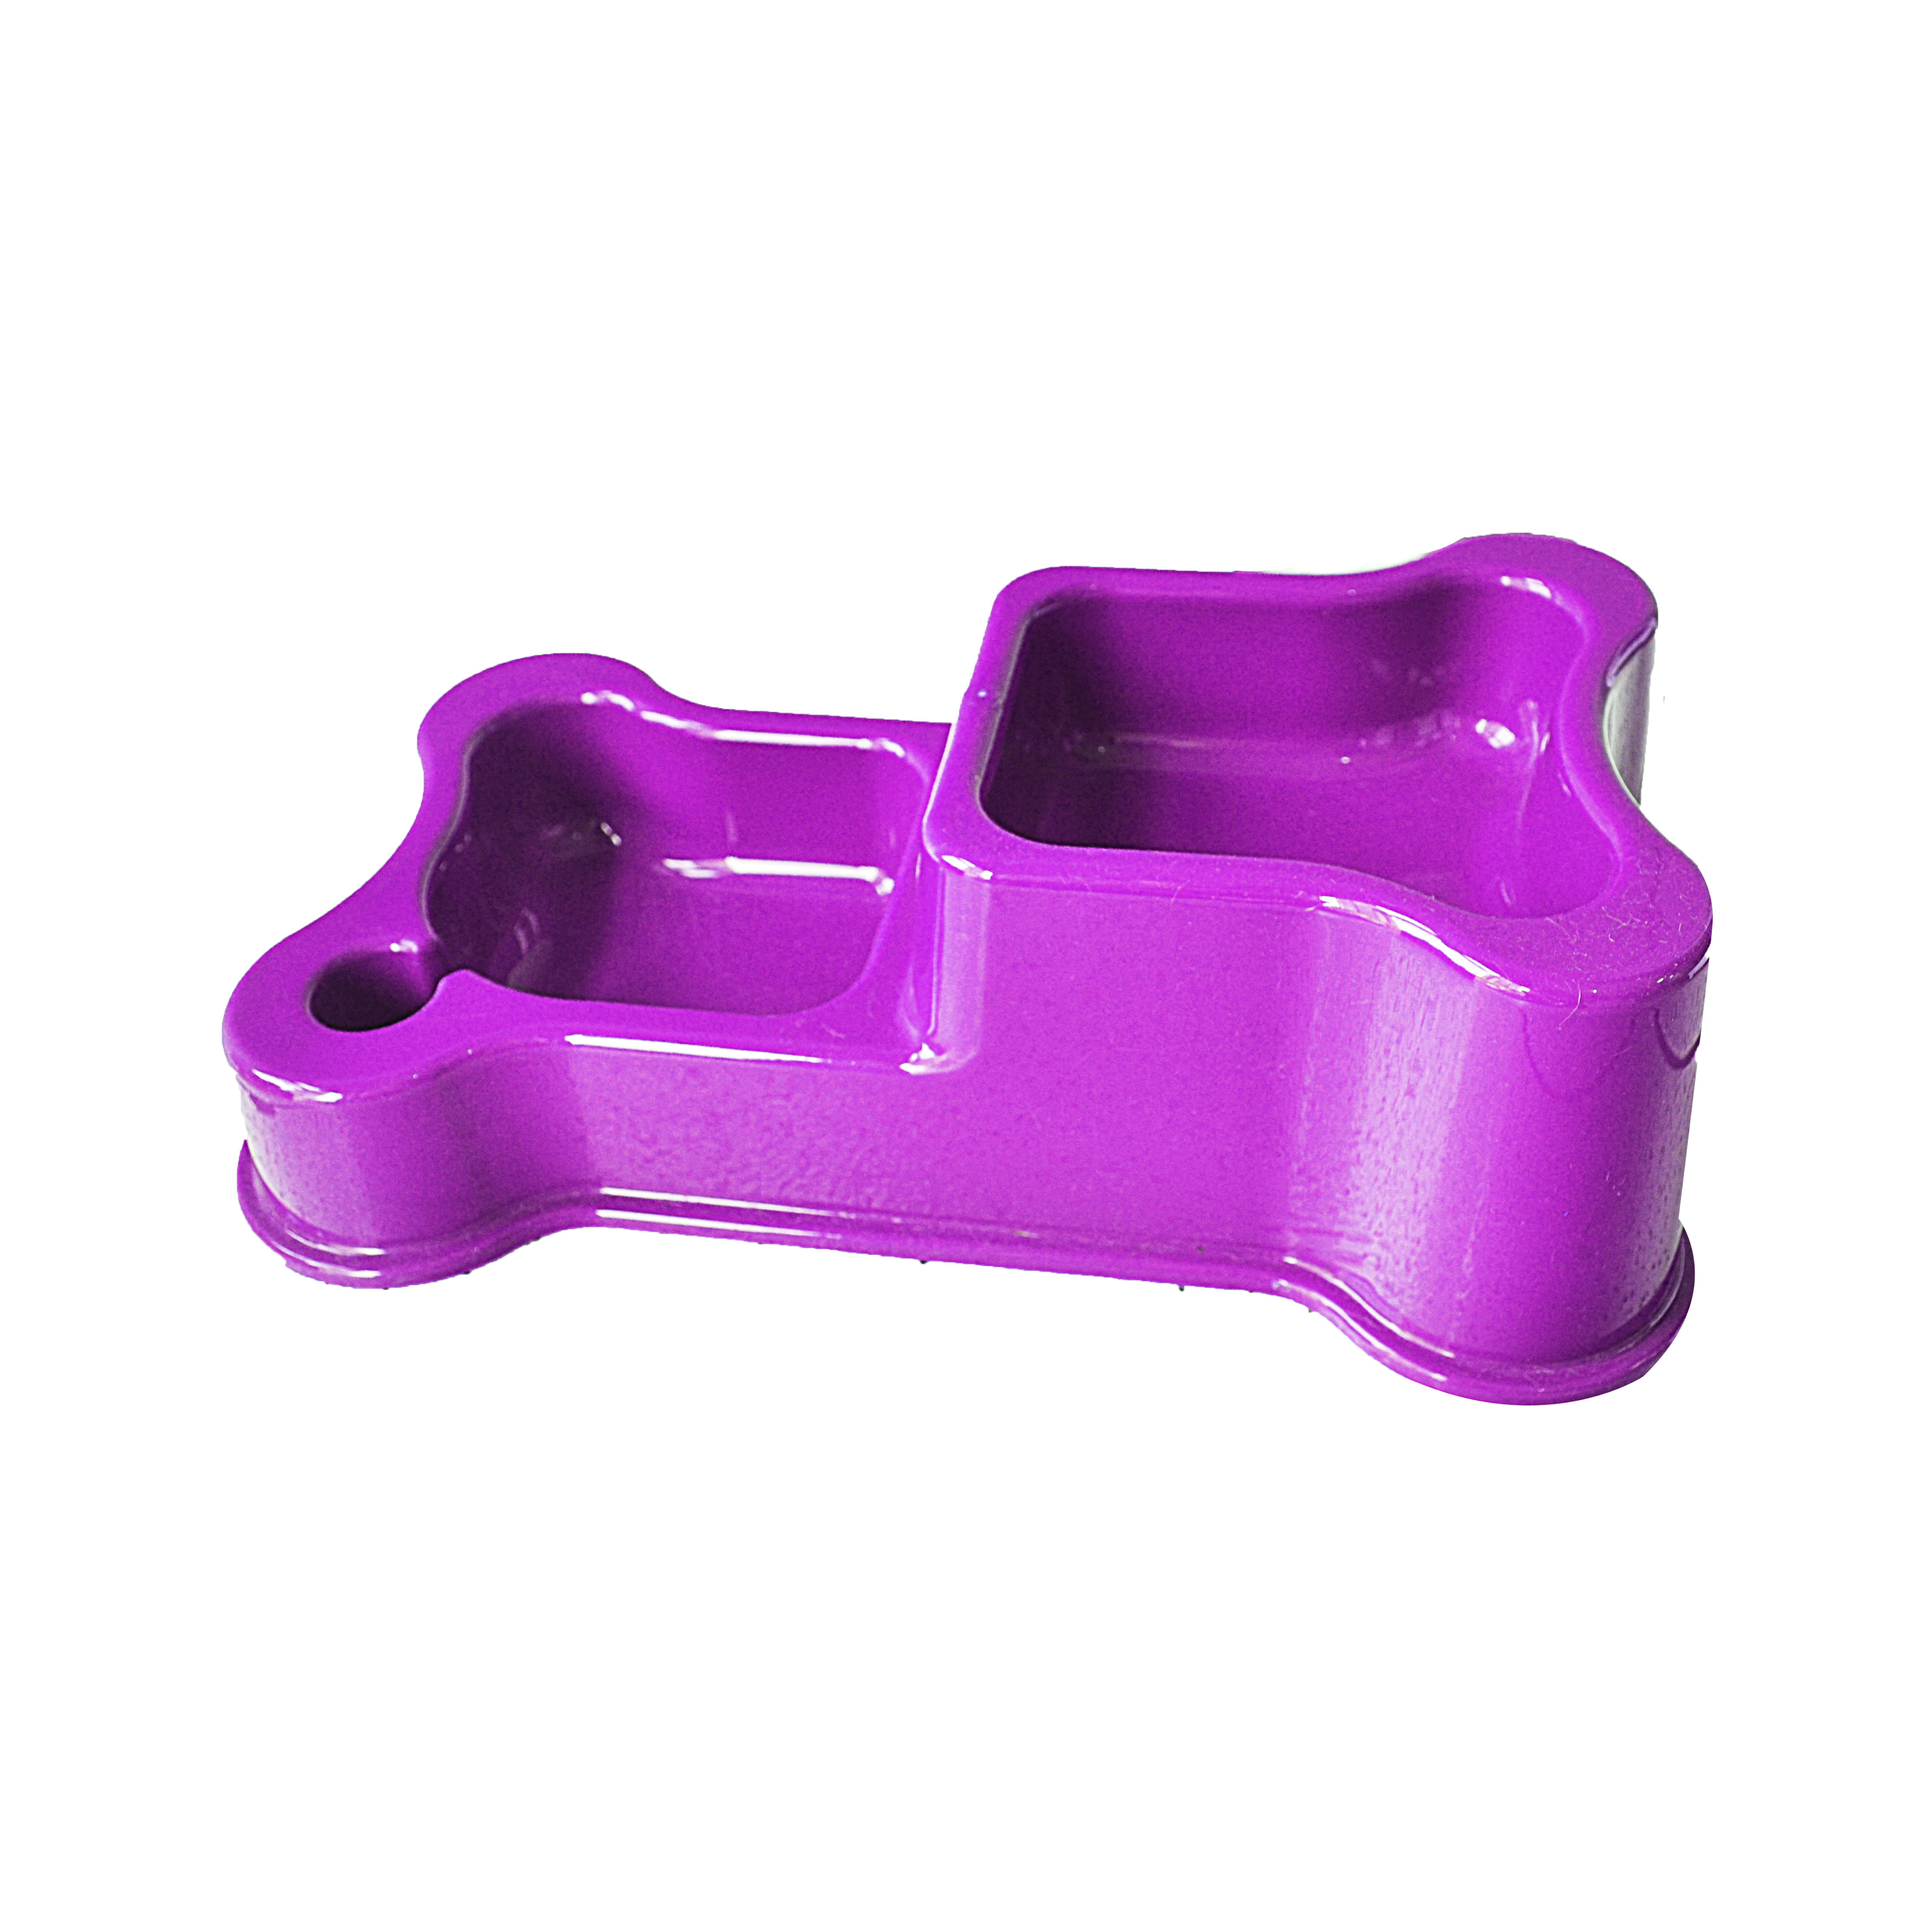 Comedouro e bebedouro duplo style purple anti-formiga